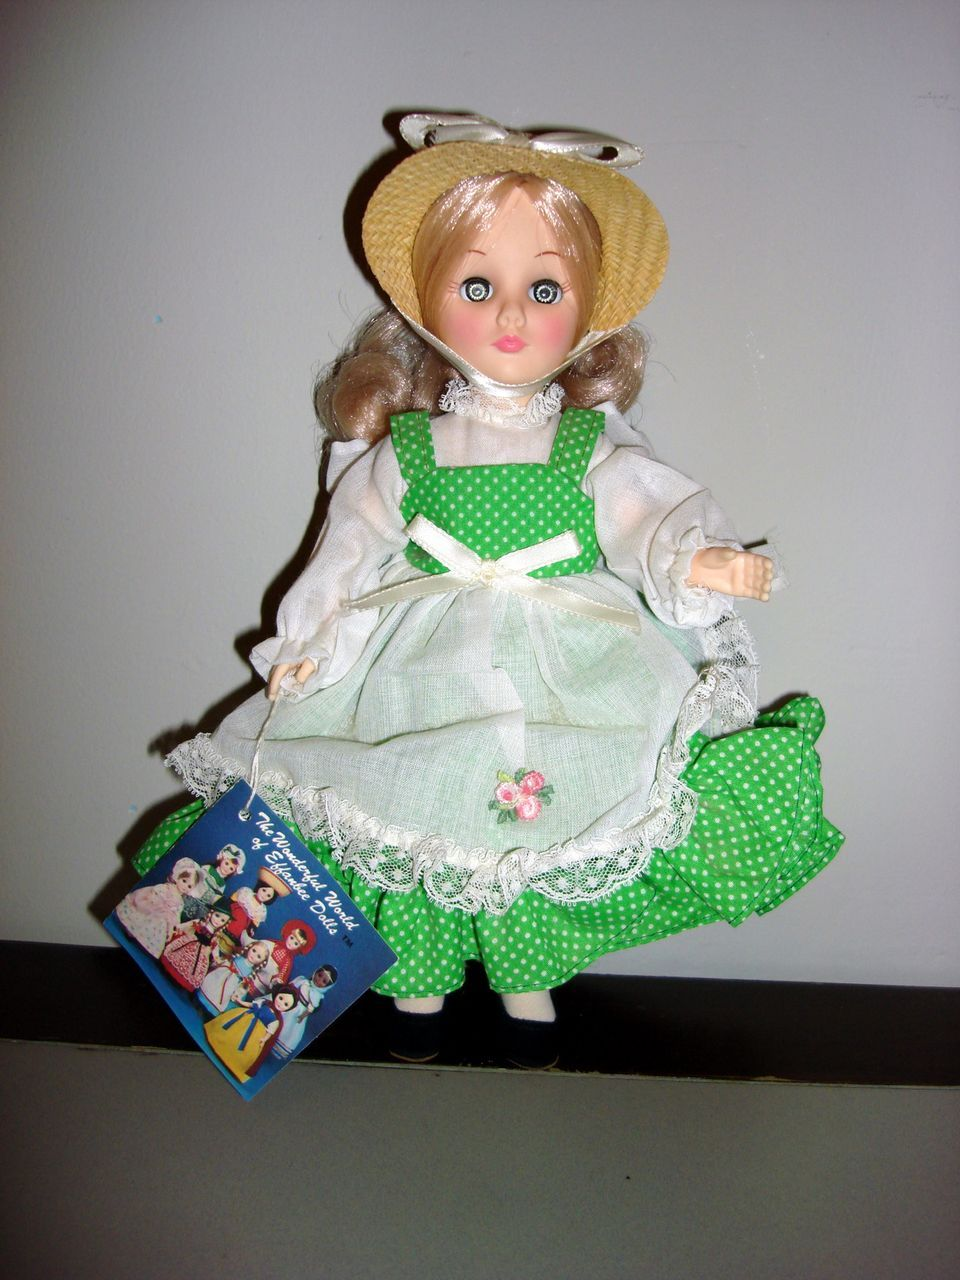 Vintage Effanbee Doll Quot Goldilocks Quot 1975 From Ottosantiques